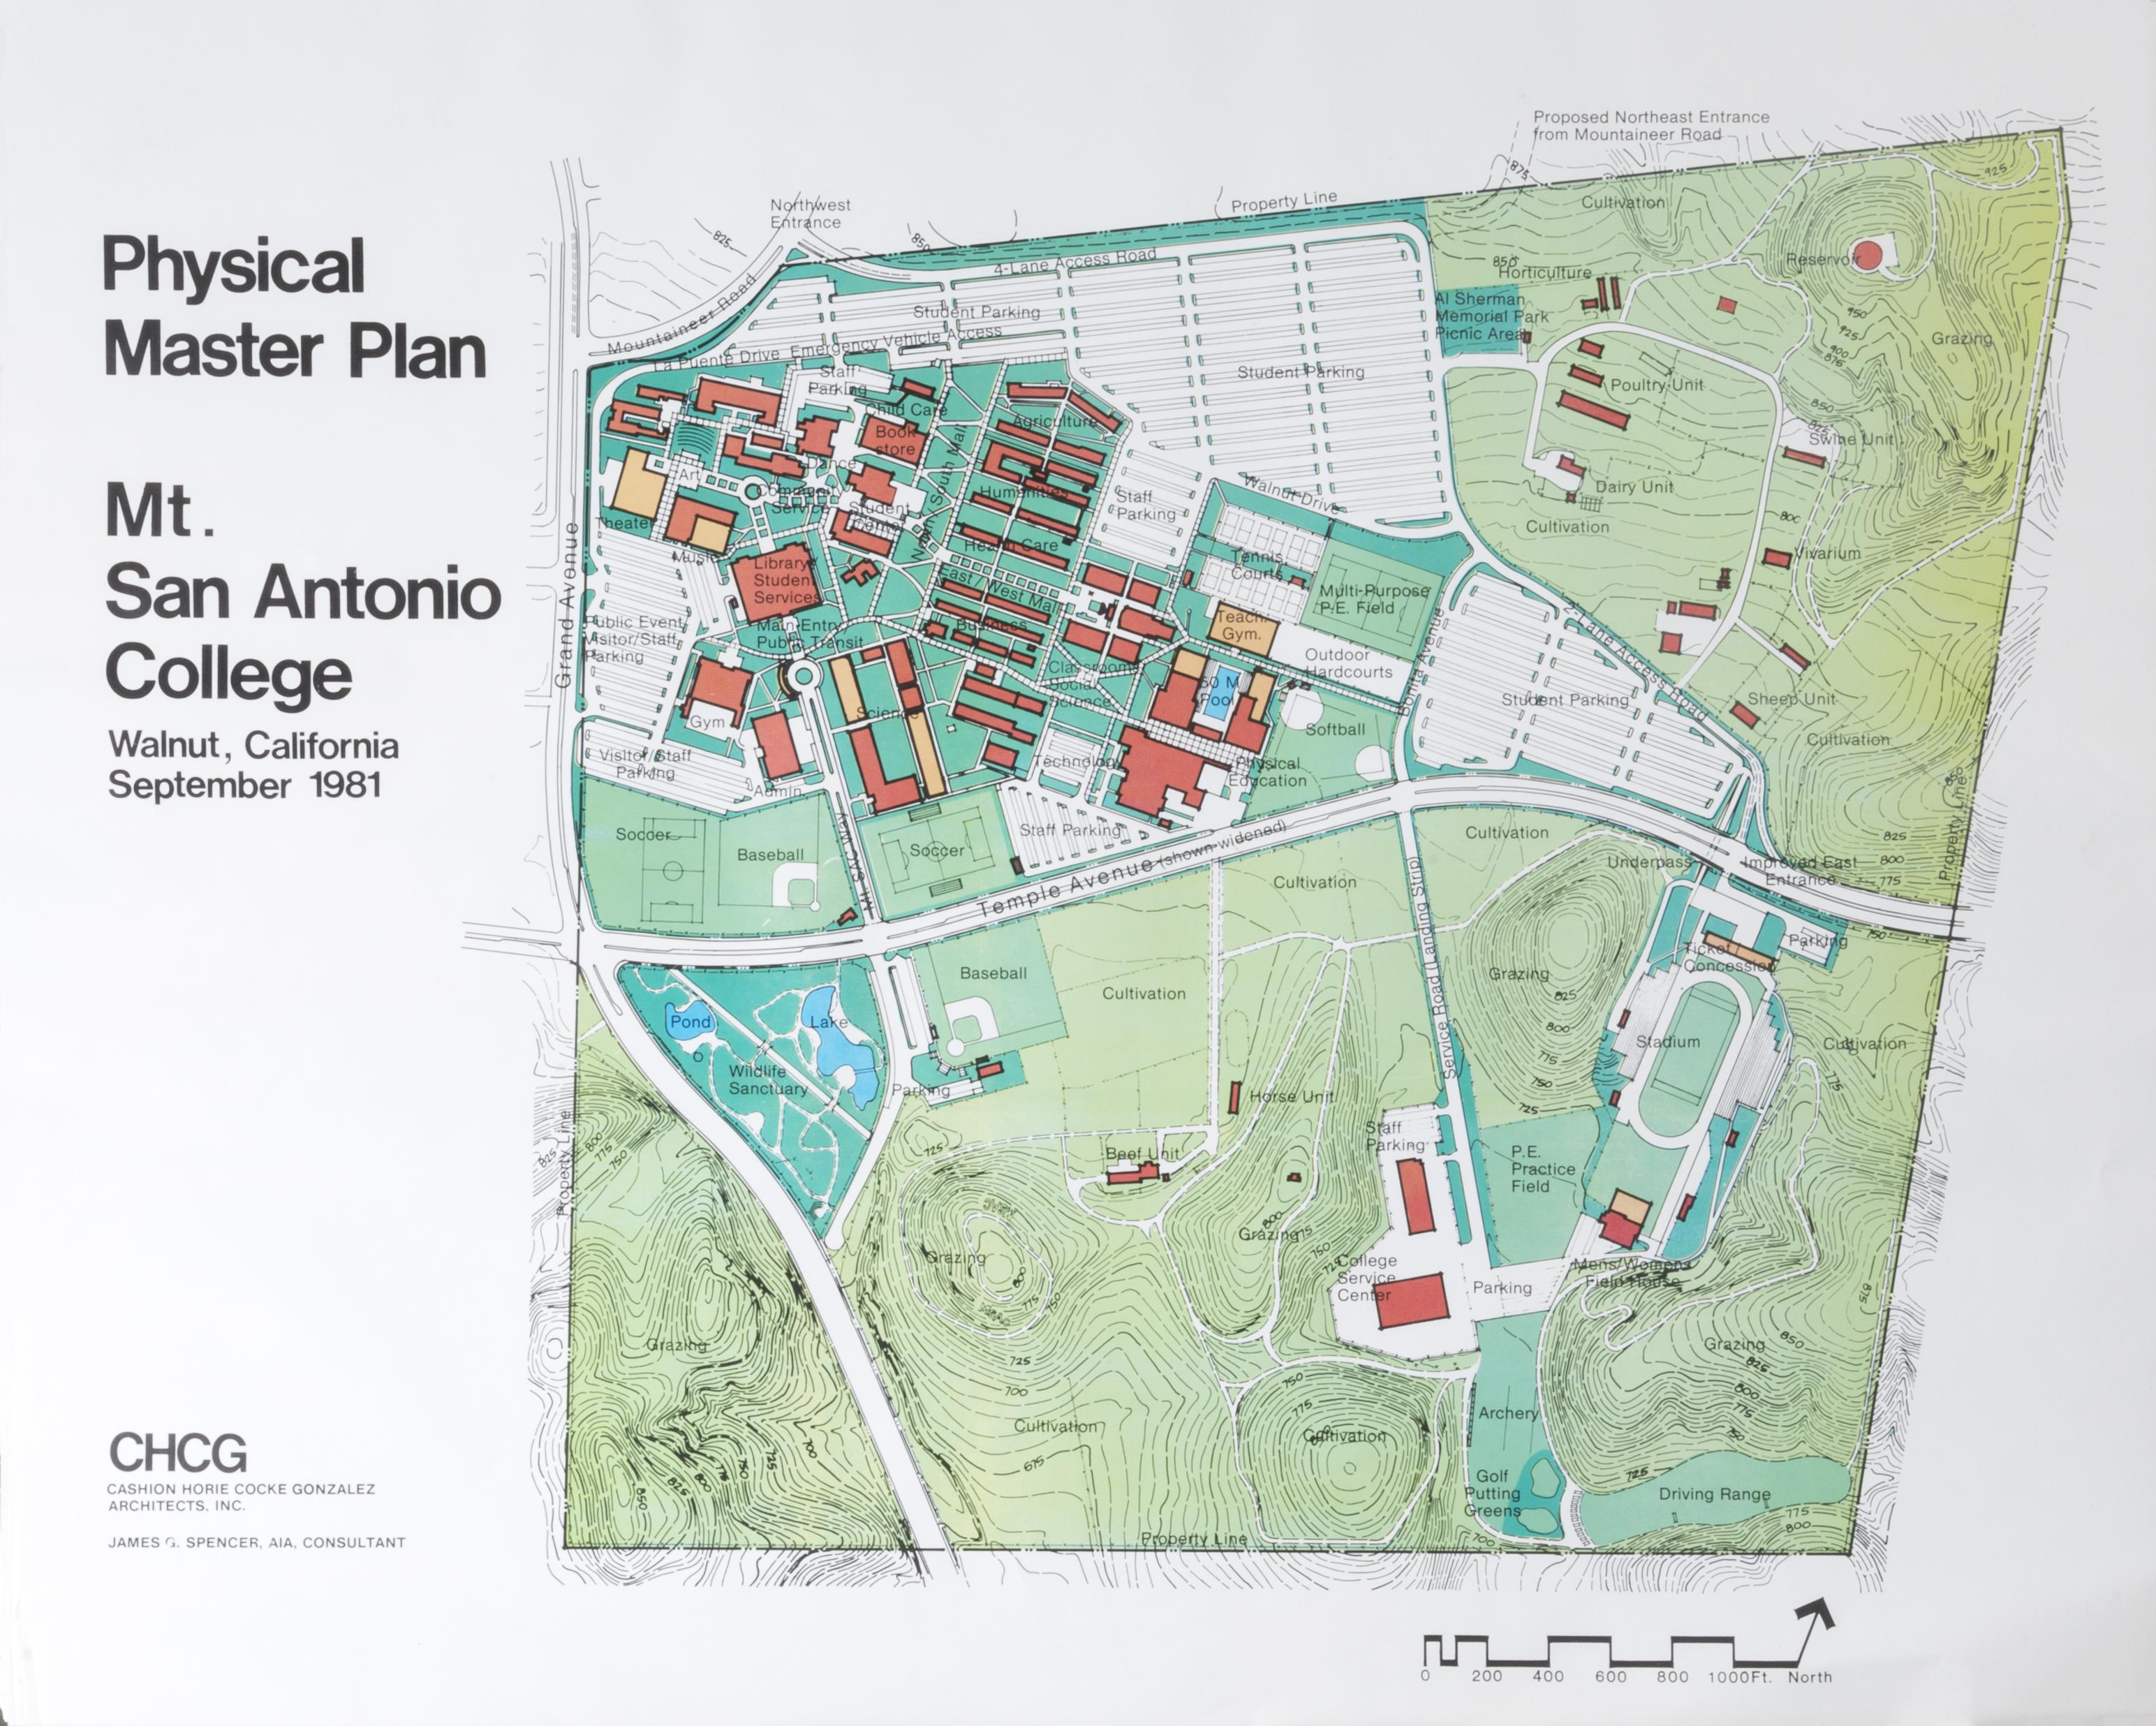 Facilities Master Plan - Mt sac campus map